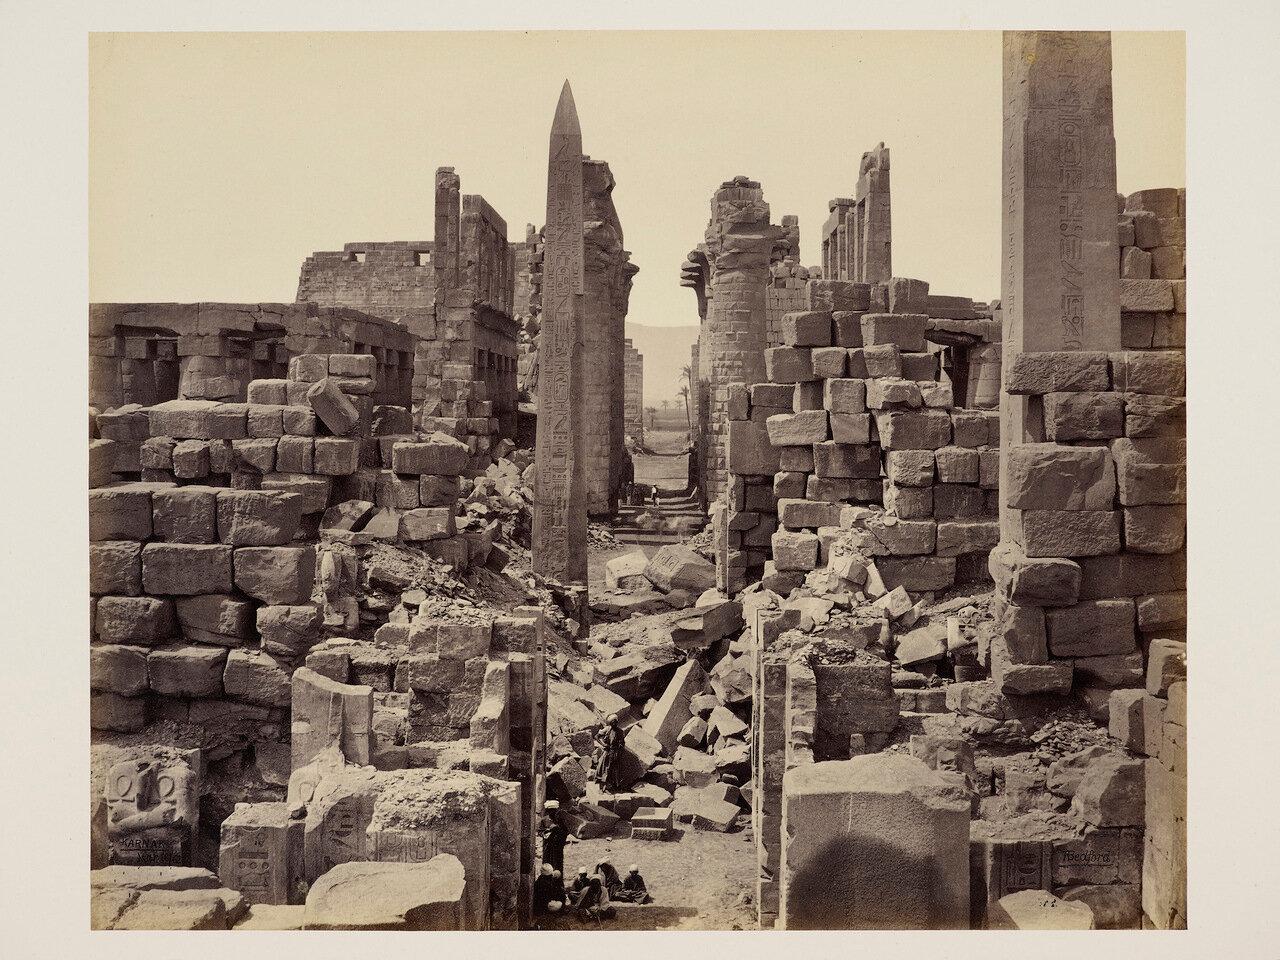 16 марта 1862. Общий вид с юга, Карнак, храм Амона